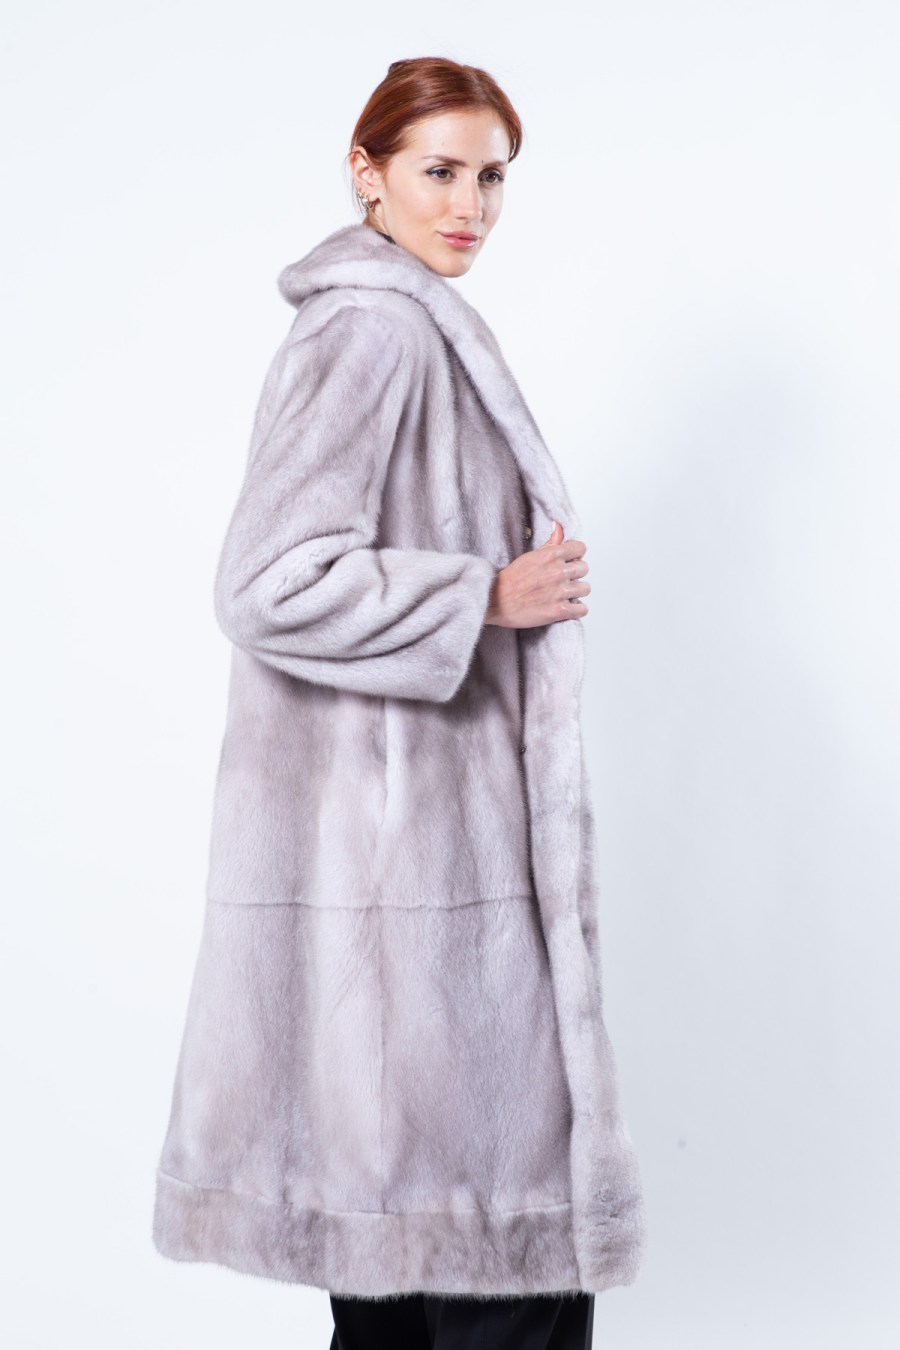 Double-faced Ice Fume Mink and Fabric Coat | Sarigianni Furs